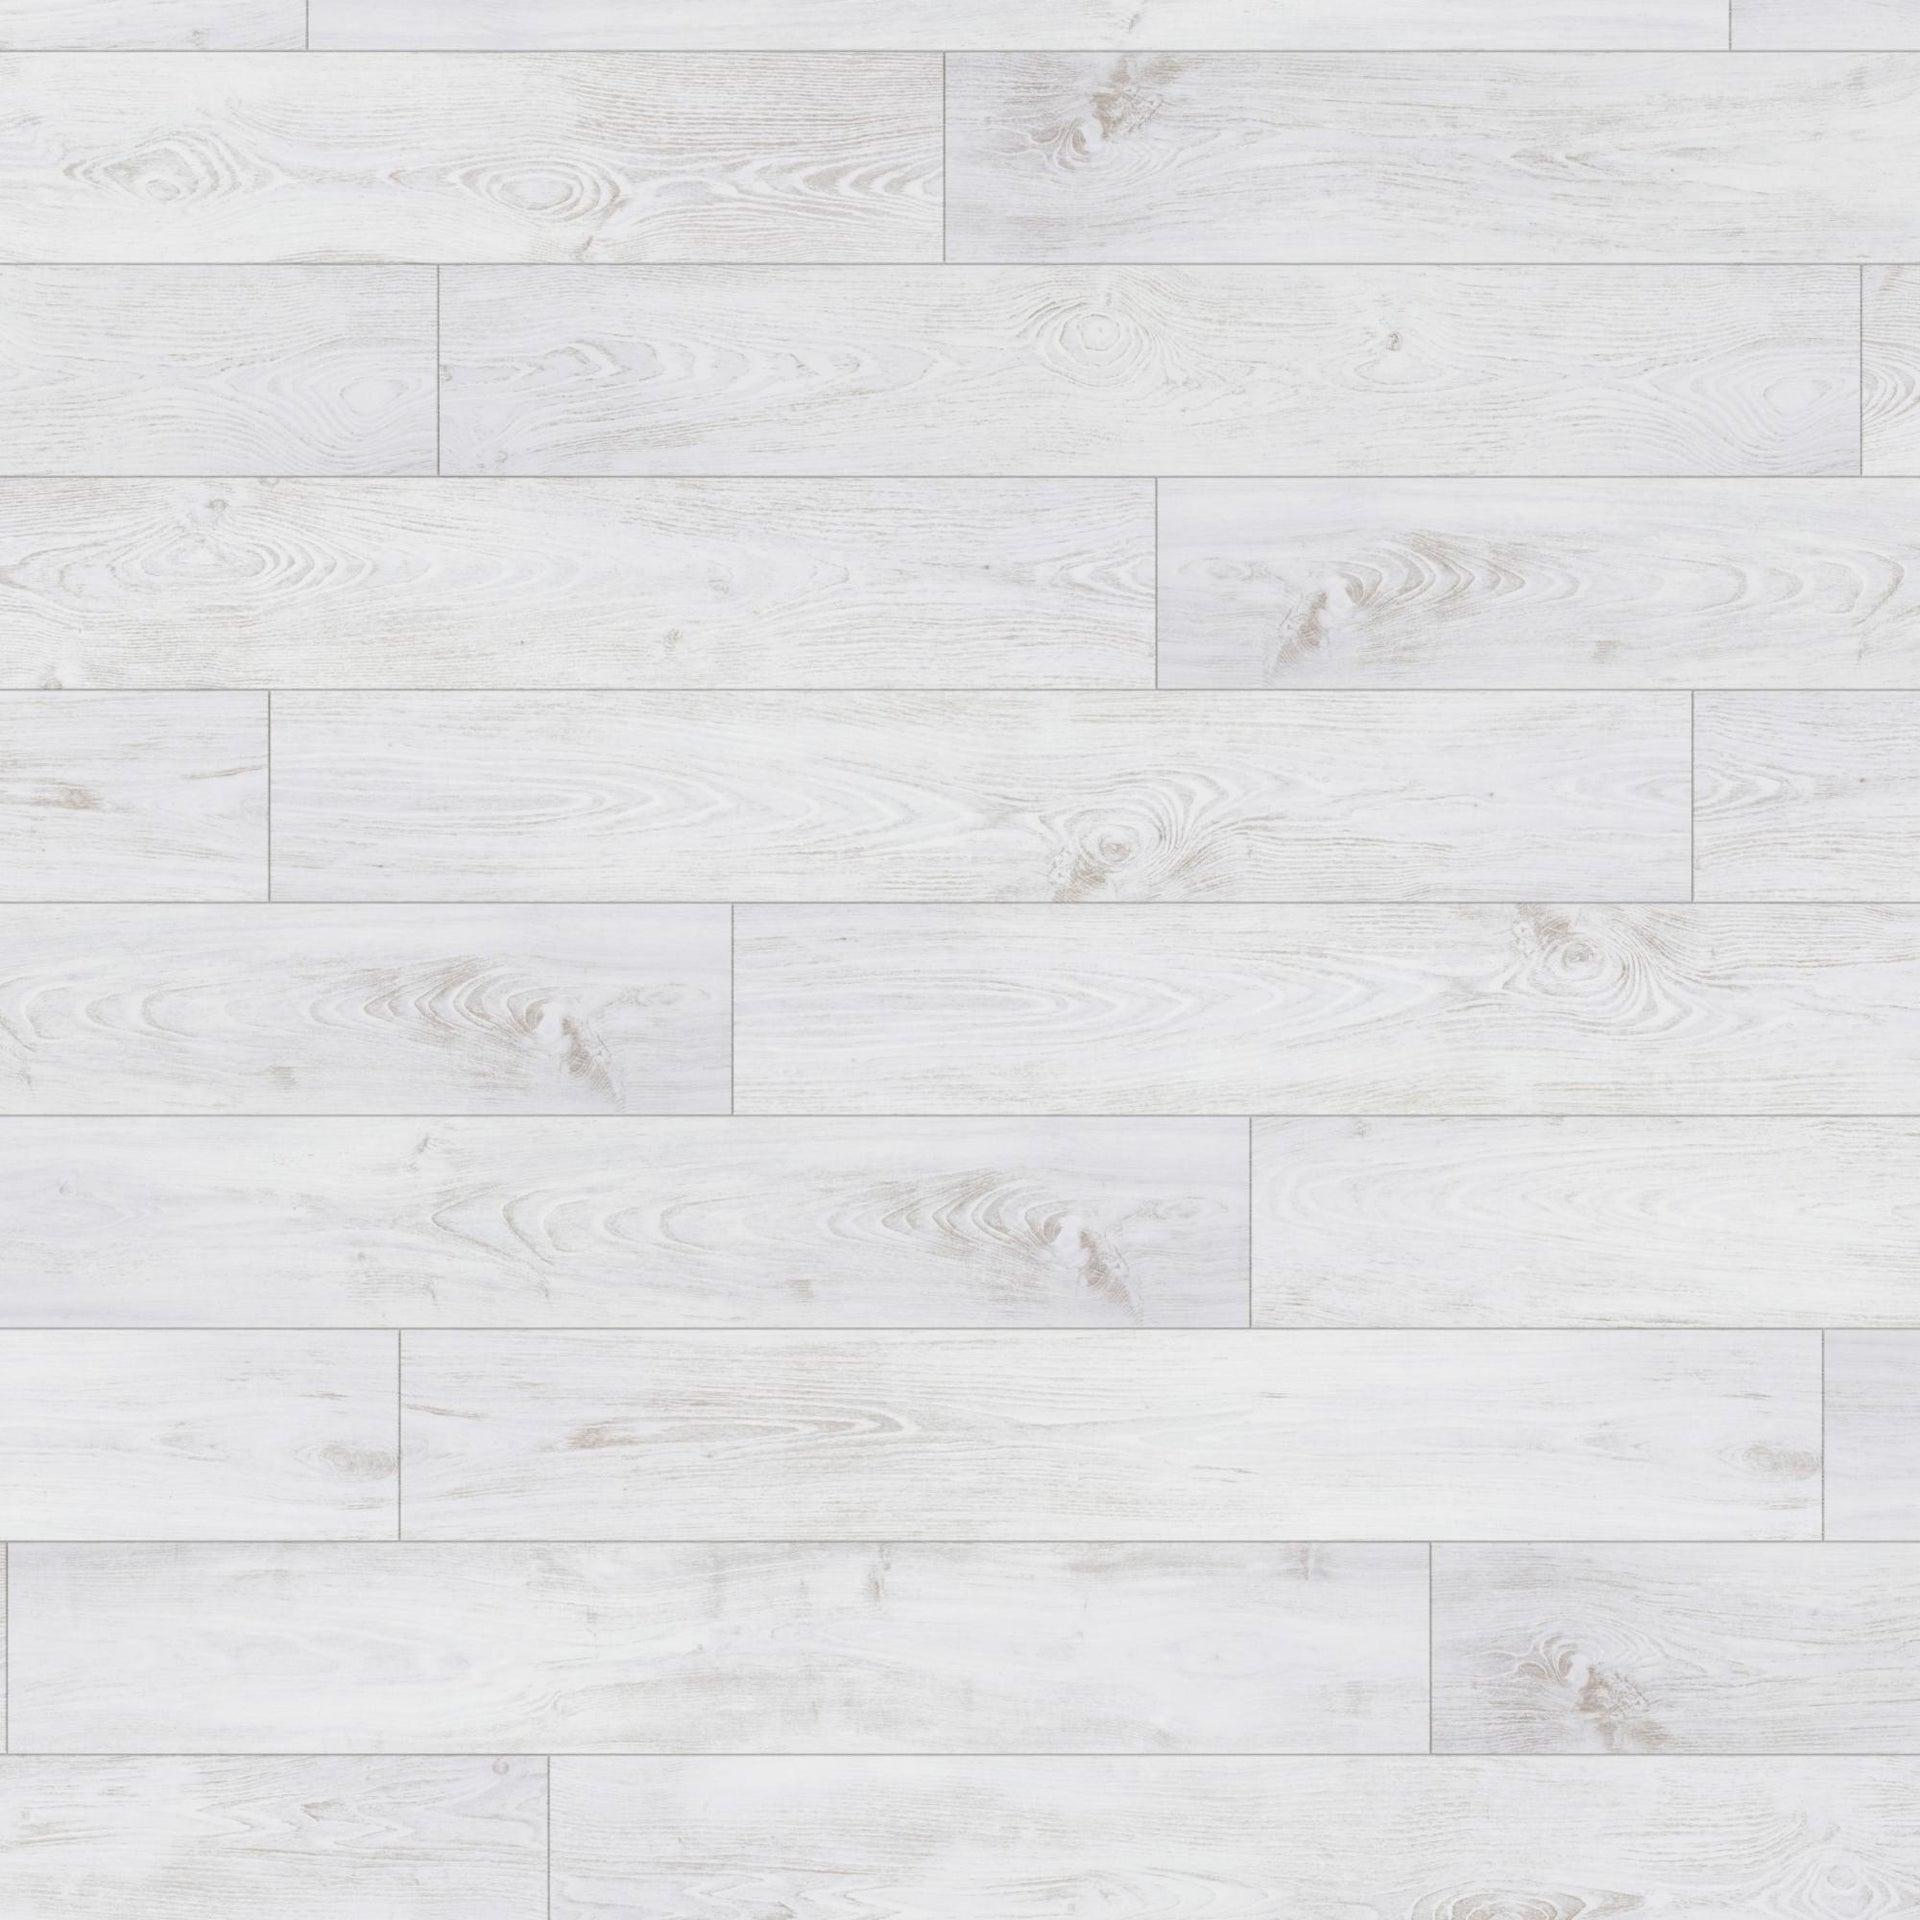 Pavimento laminato Nuiza Sp 8 mm beige - 3